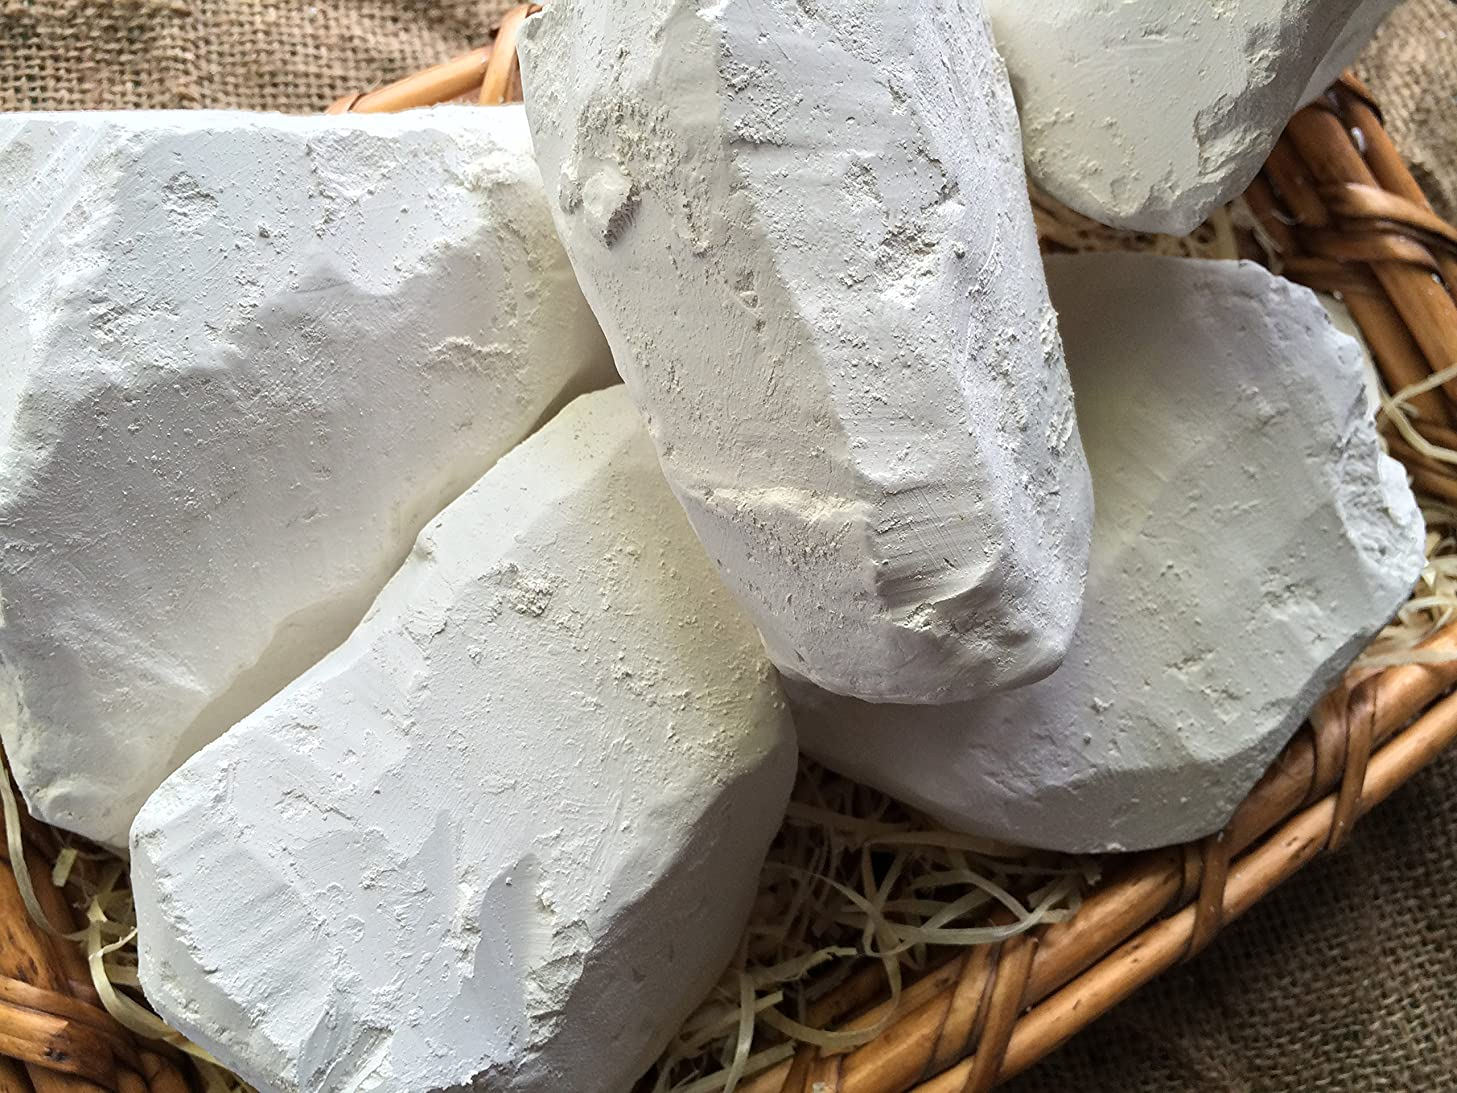 Edible chalk, SUMY edible Chalk chunks (lump) natural for eating (food), 4 oz (113 g)